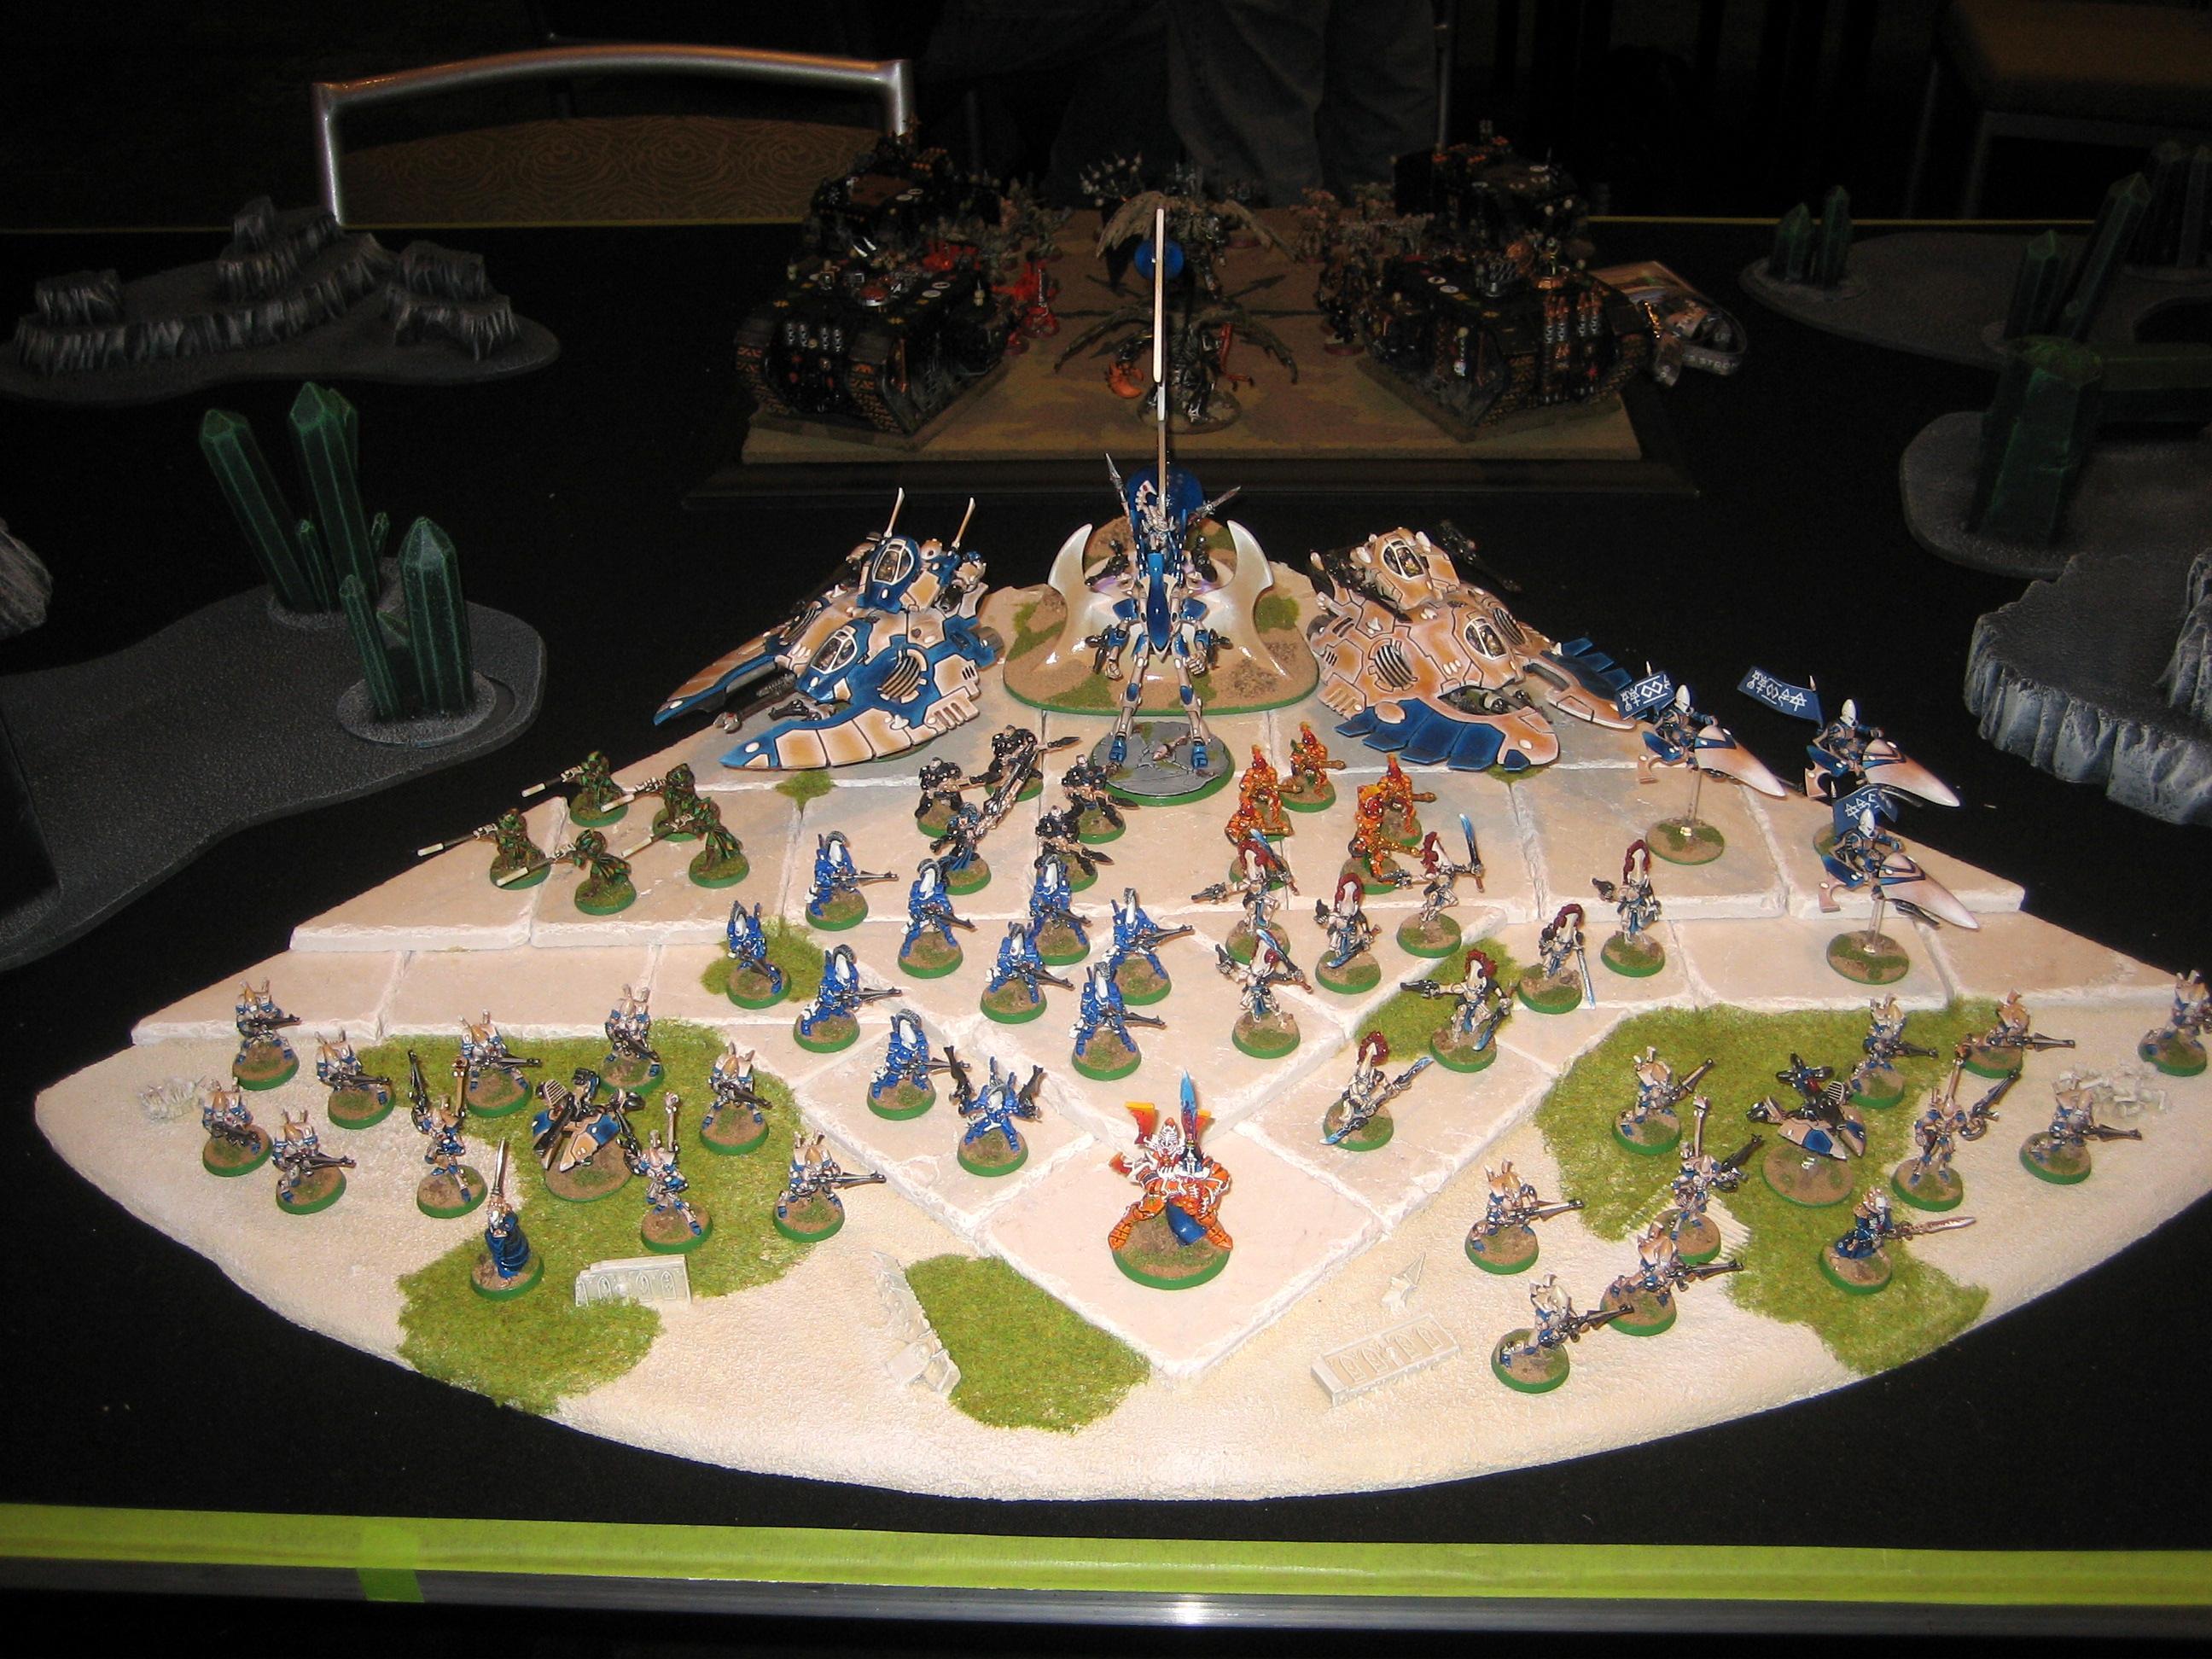 40k Chamionships Tournament, Adepticon 2009, Display, Eldar